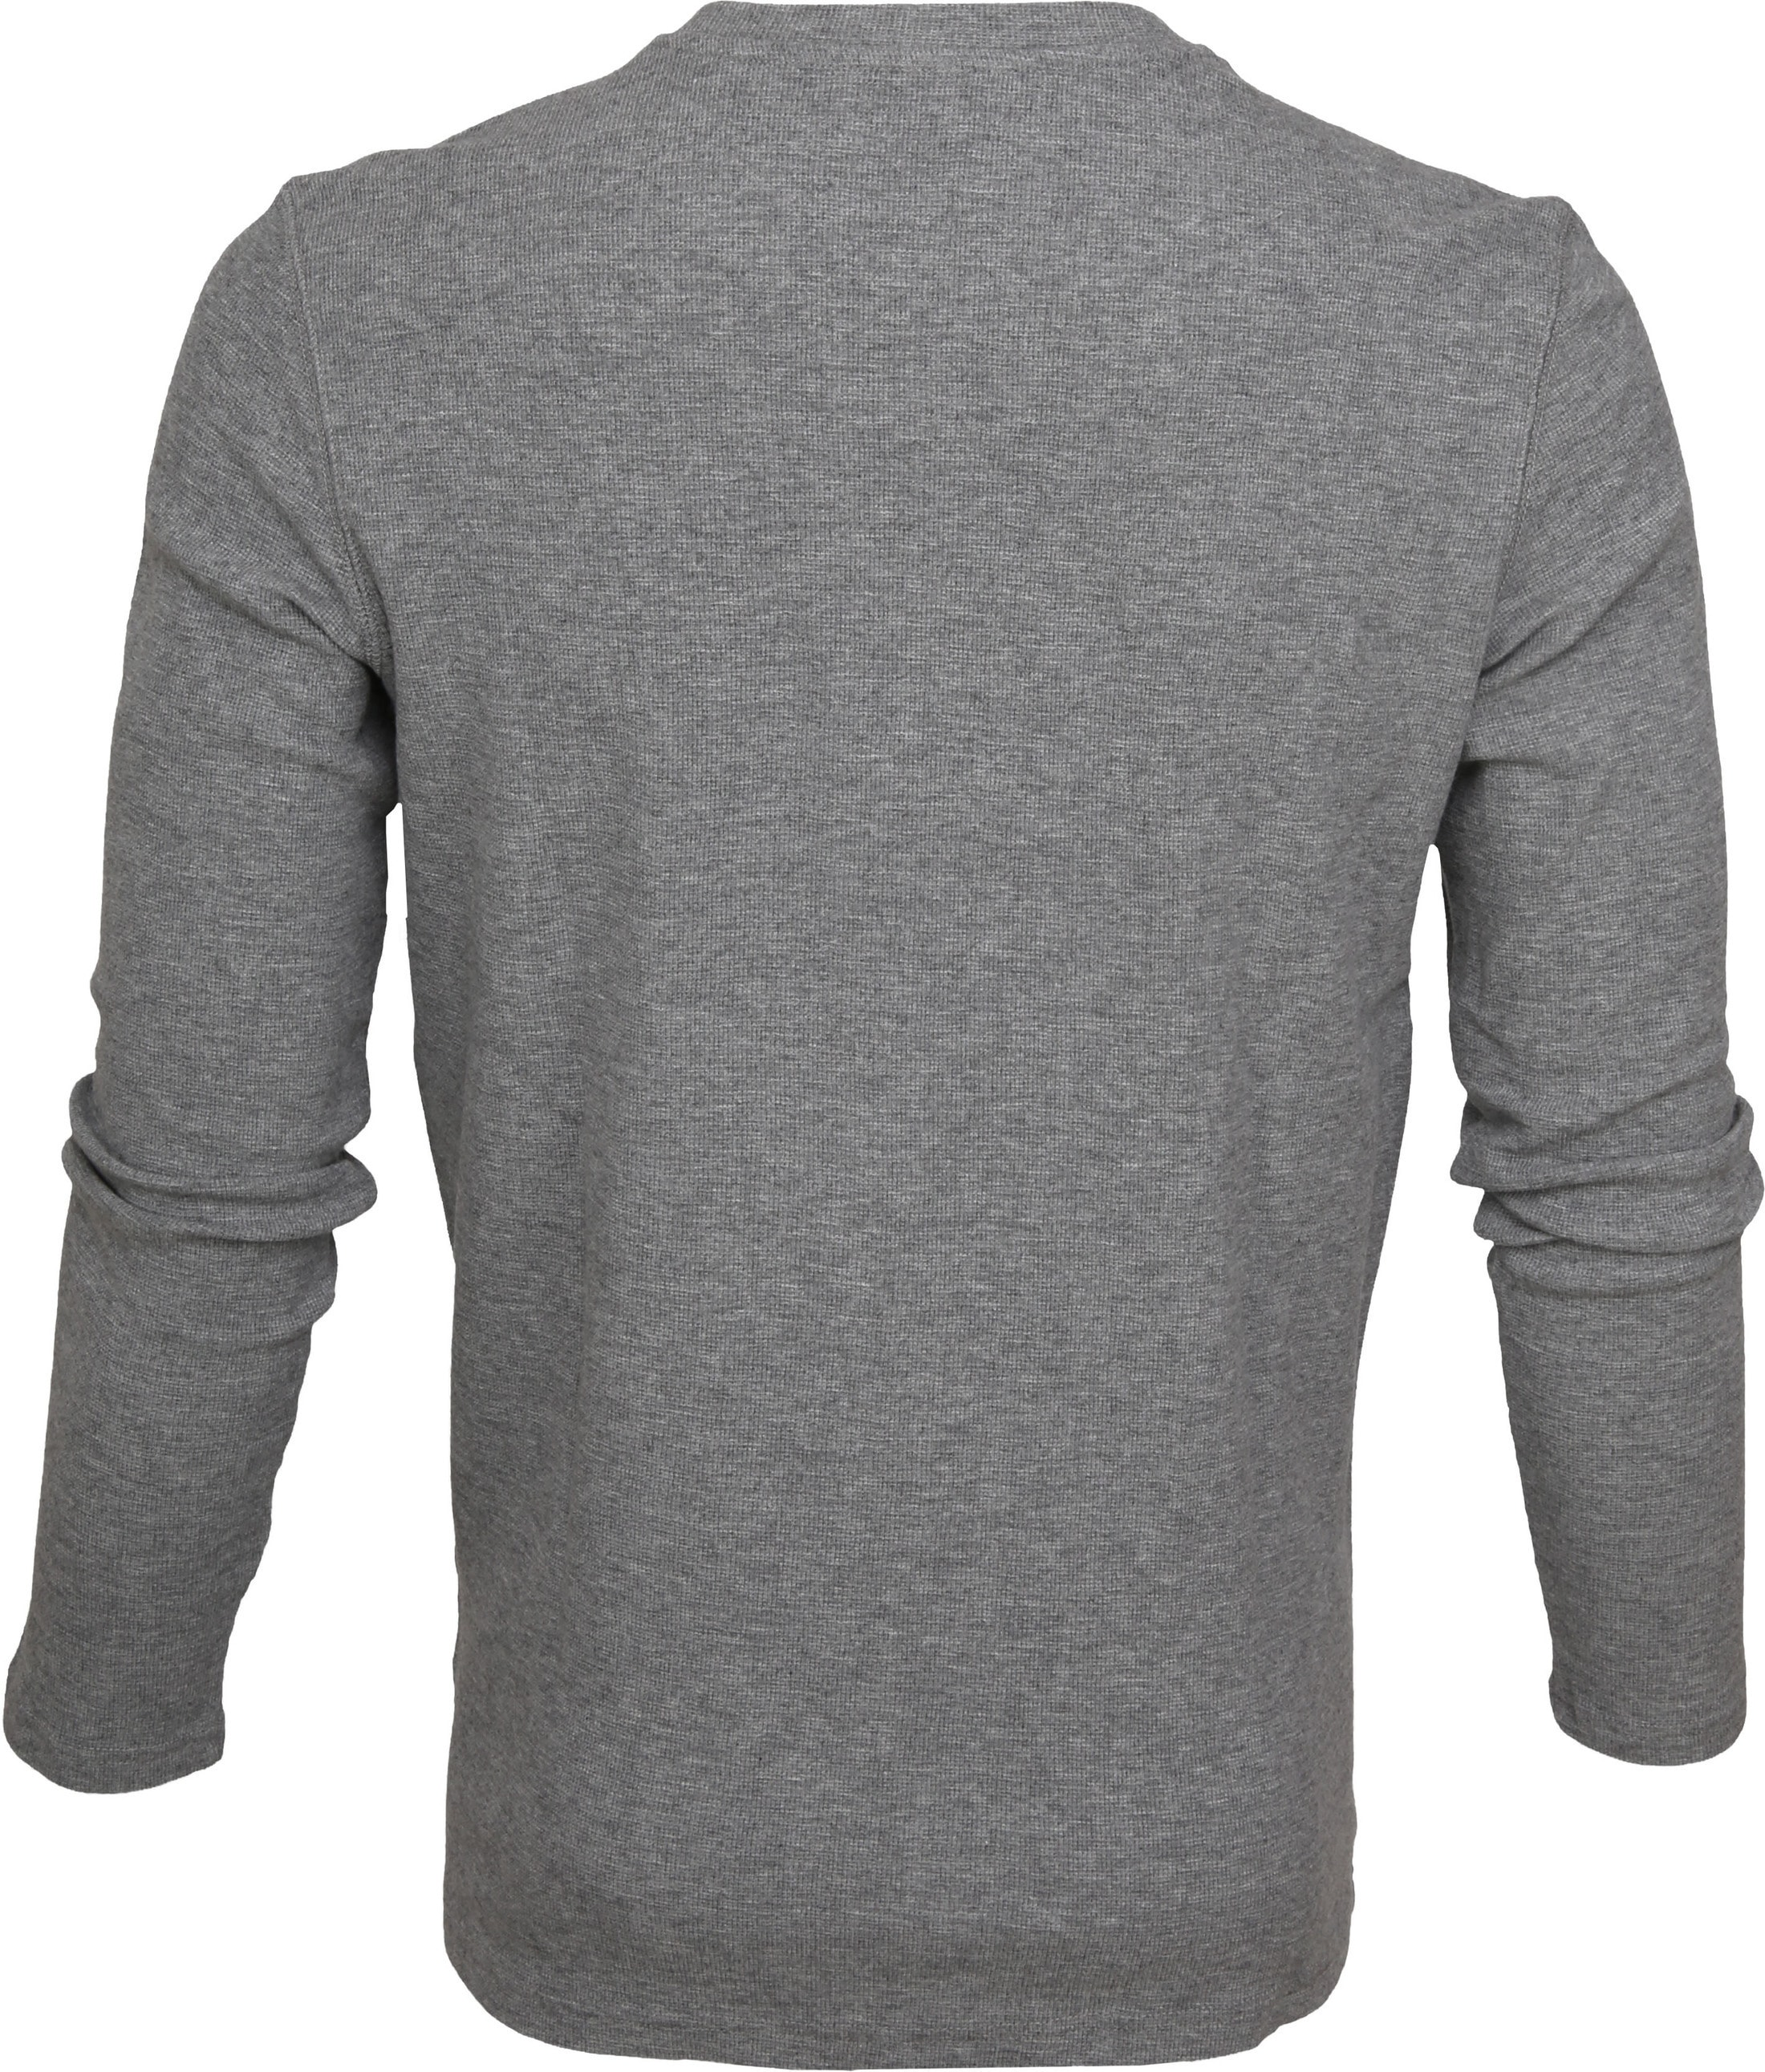 Marc O'Polo T-shirt Longsleeve Grijs foto 2